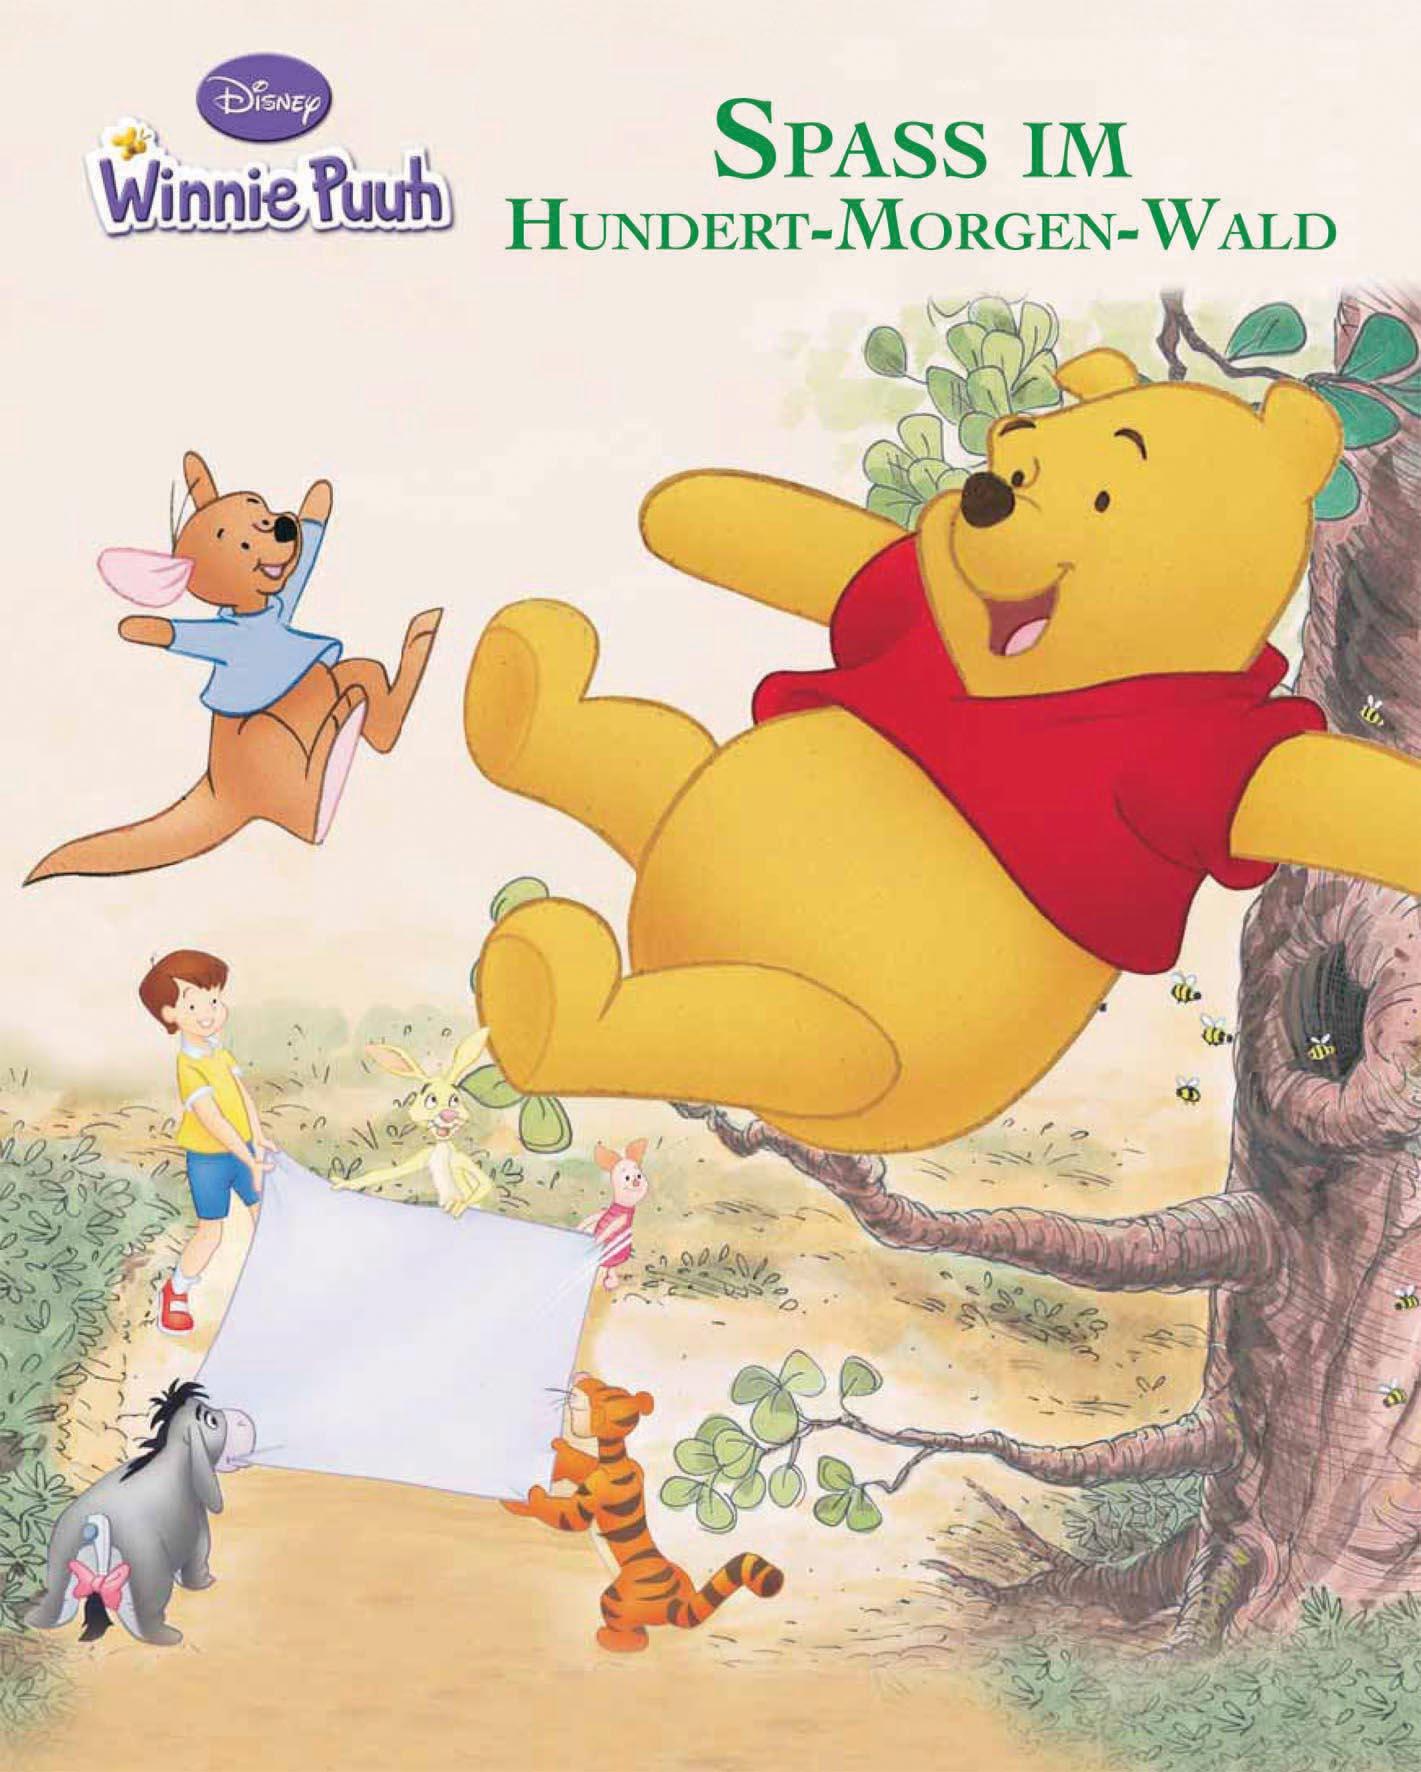 Winnie Puuh Spass im Hundert-Morgen-Wald - Walt Disney